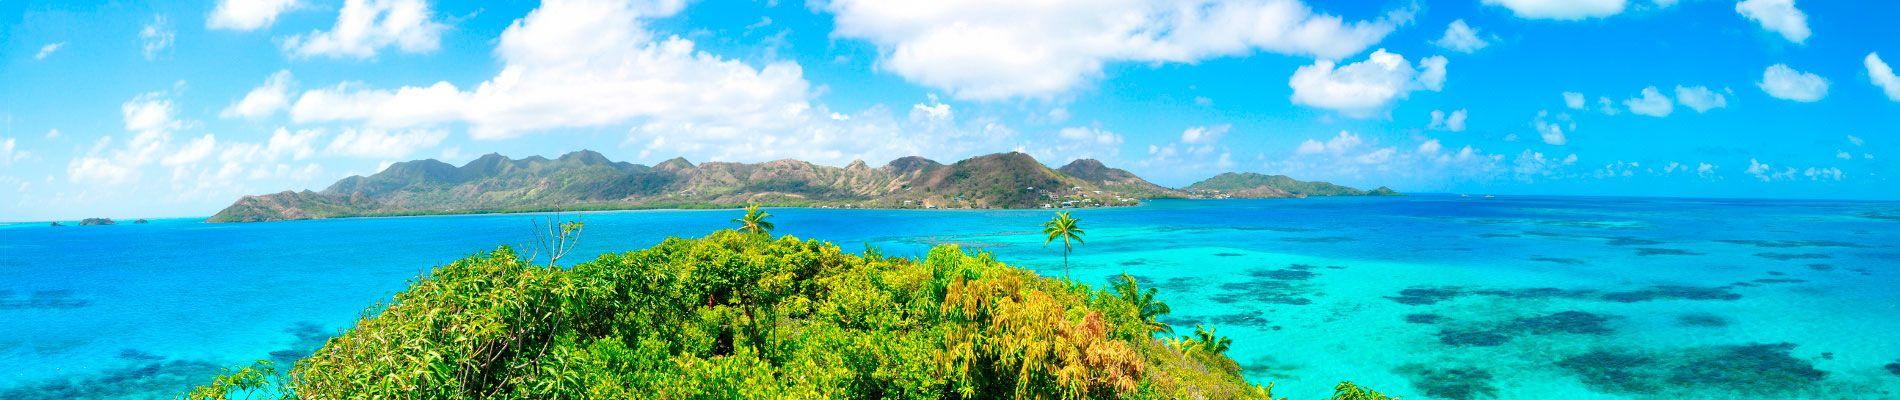 colombie-providencia-island-st